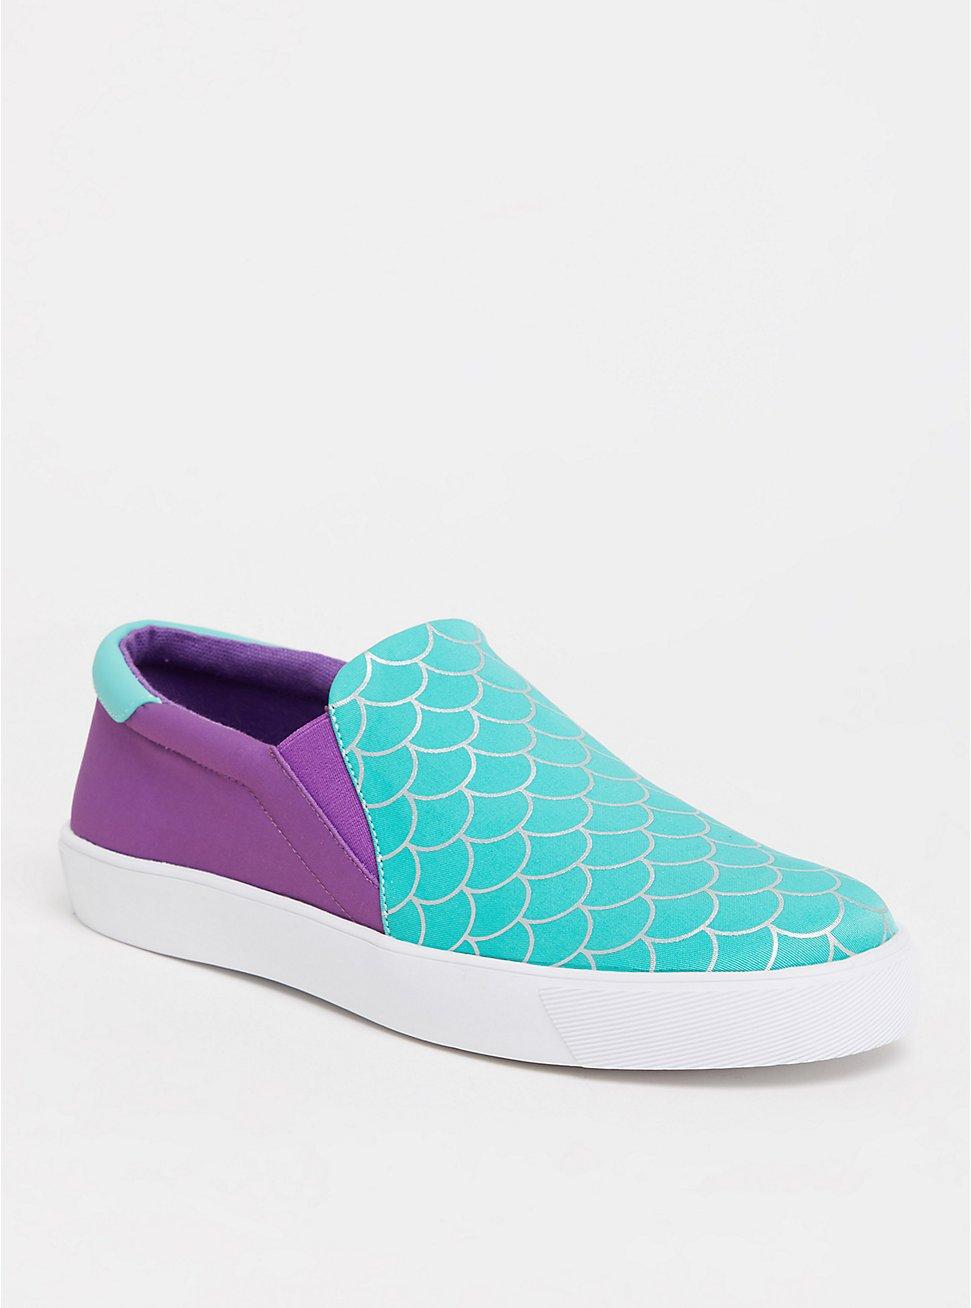 Disney The Little Mermaid Ariel Slip-On Sneaker (WW), GREEN, hi-res